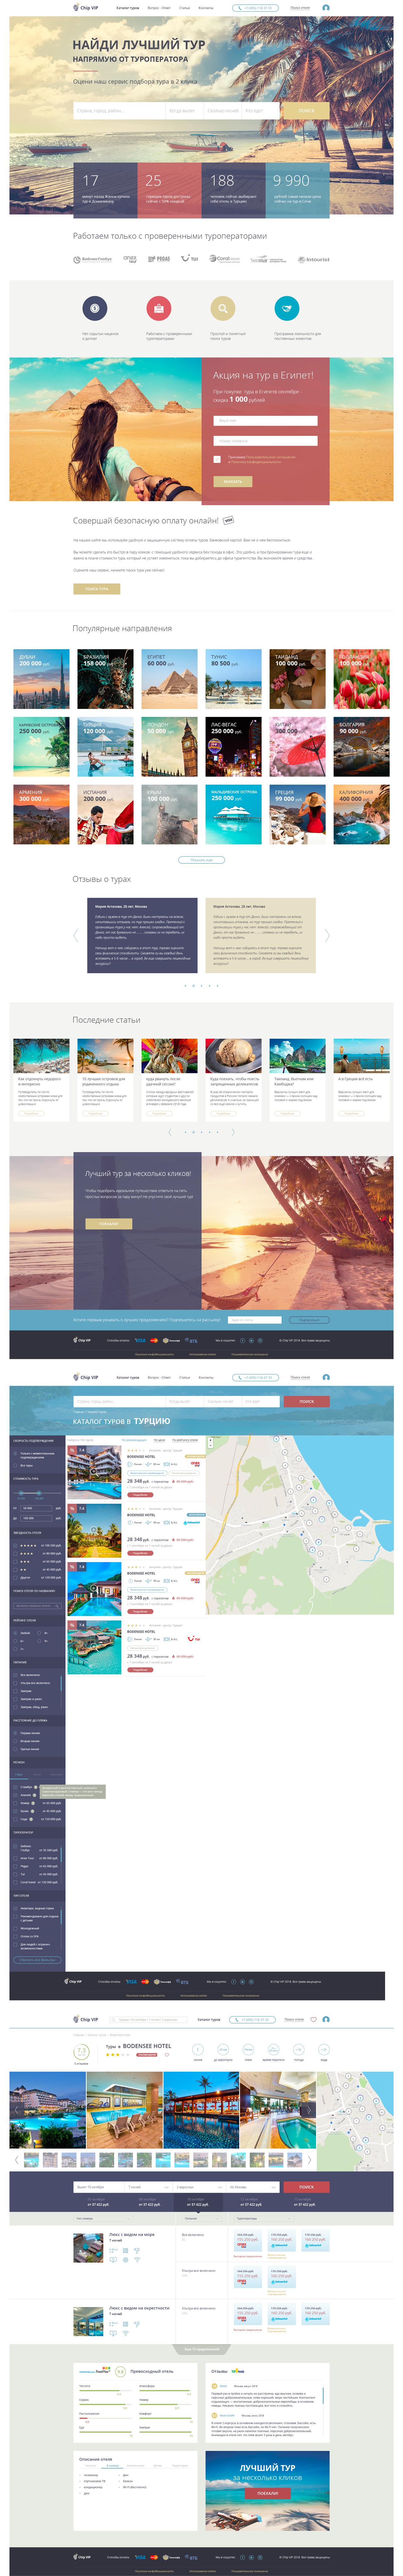 Адаптивный дизайн сайта-каталога туров ChipVip